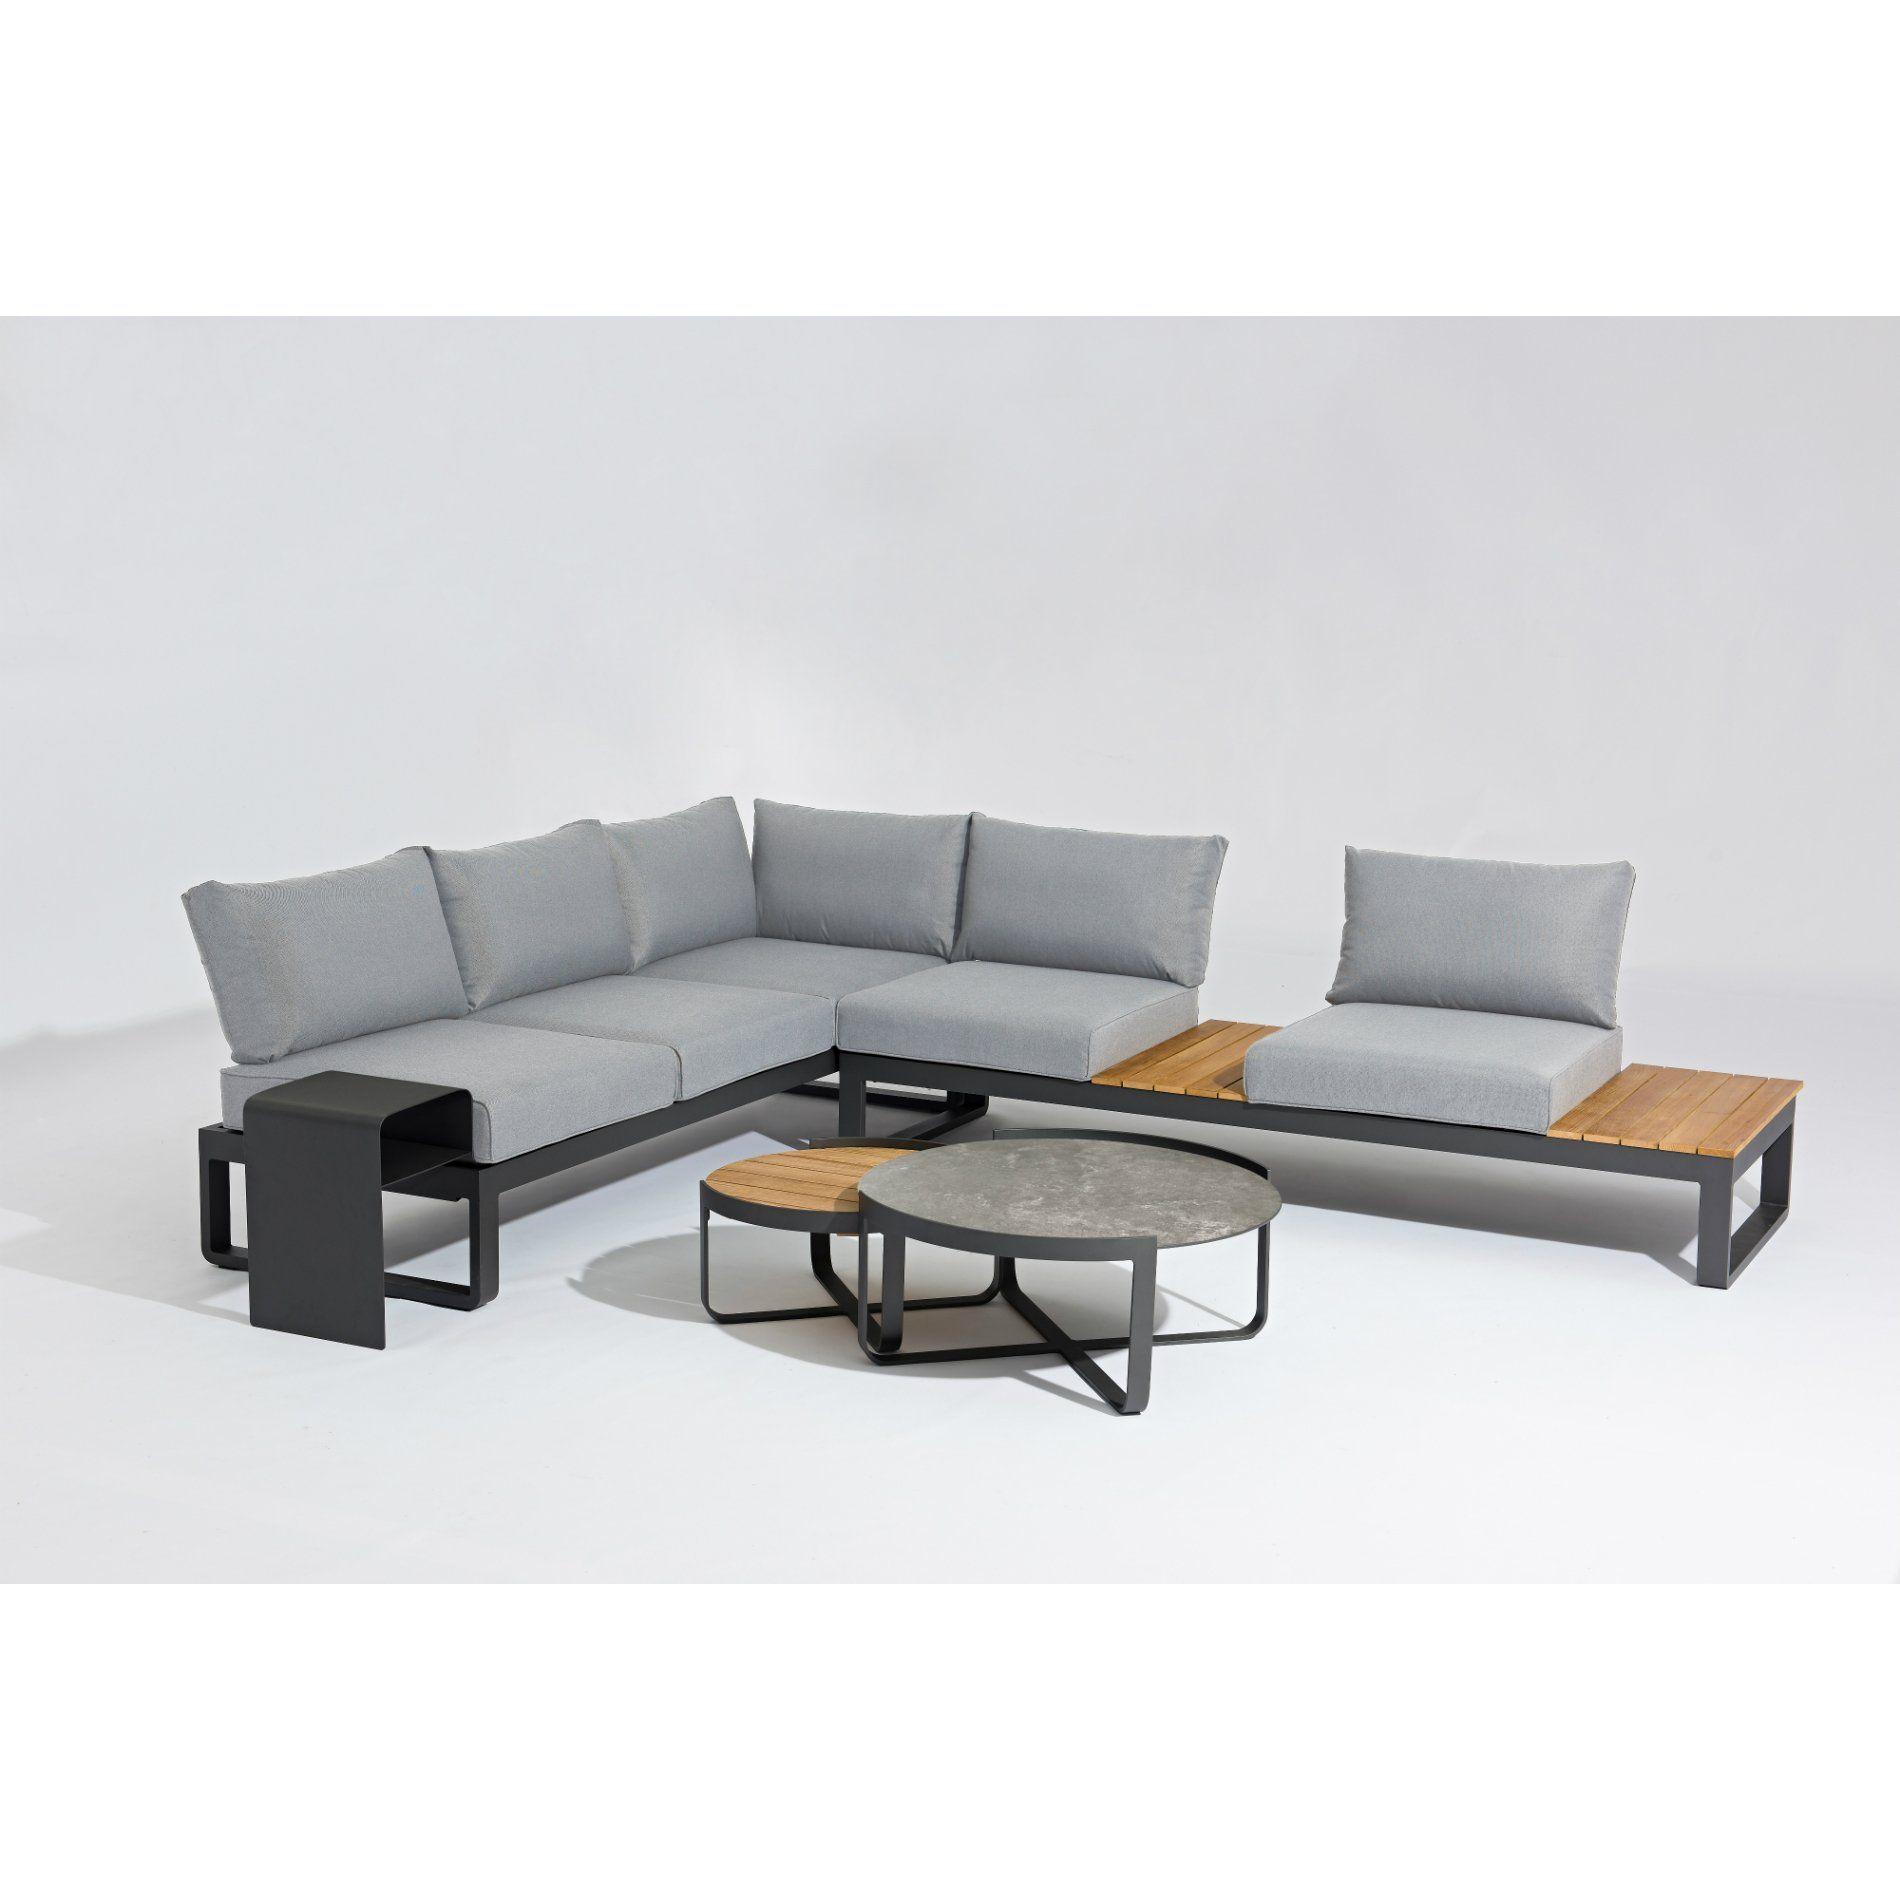 Zebra Fly Lounge Loungeset Lounge Mobel Moderne Lounge Aussenmobel